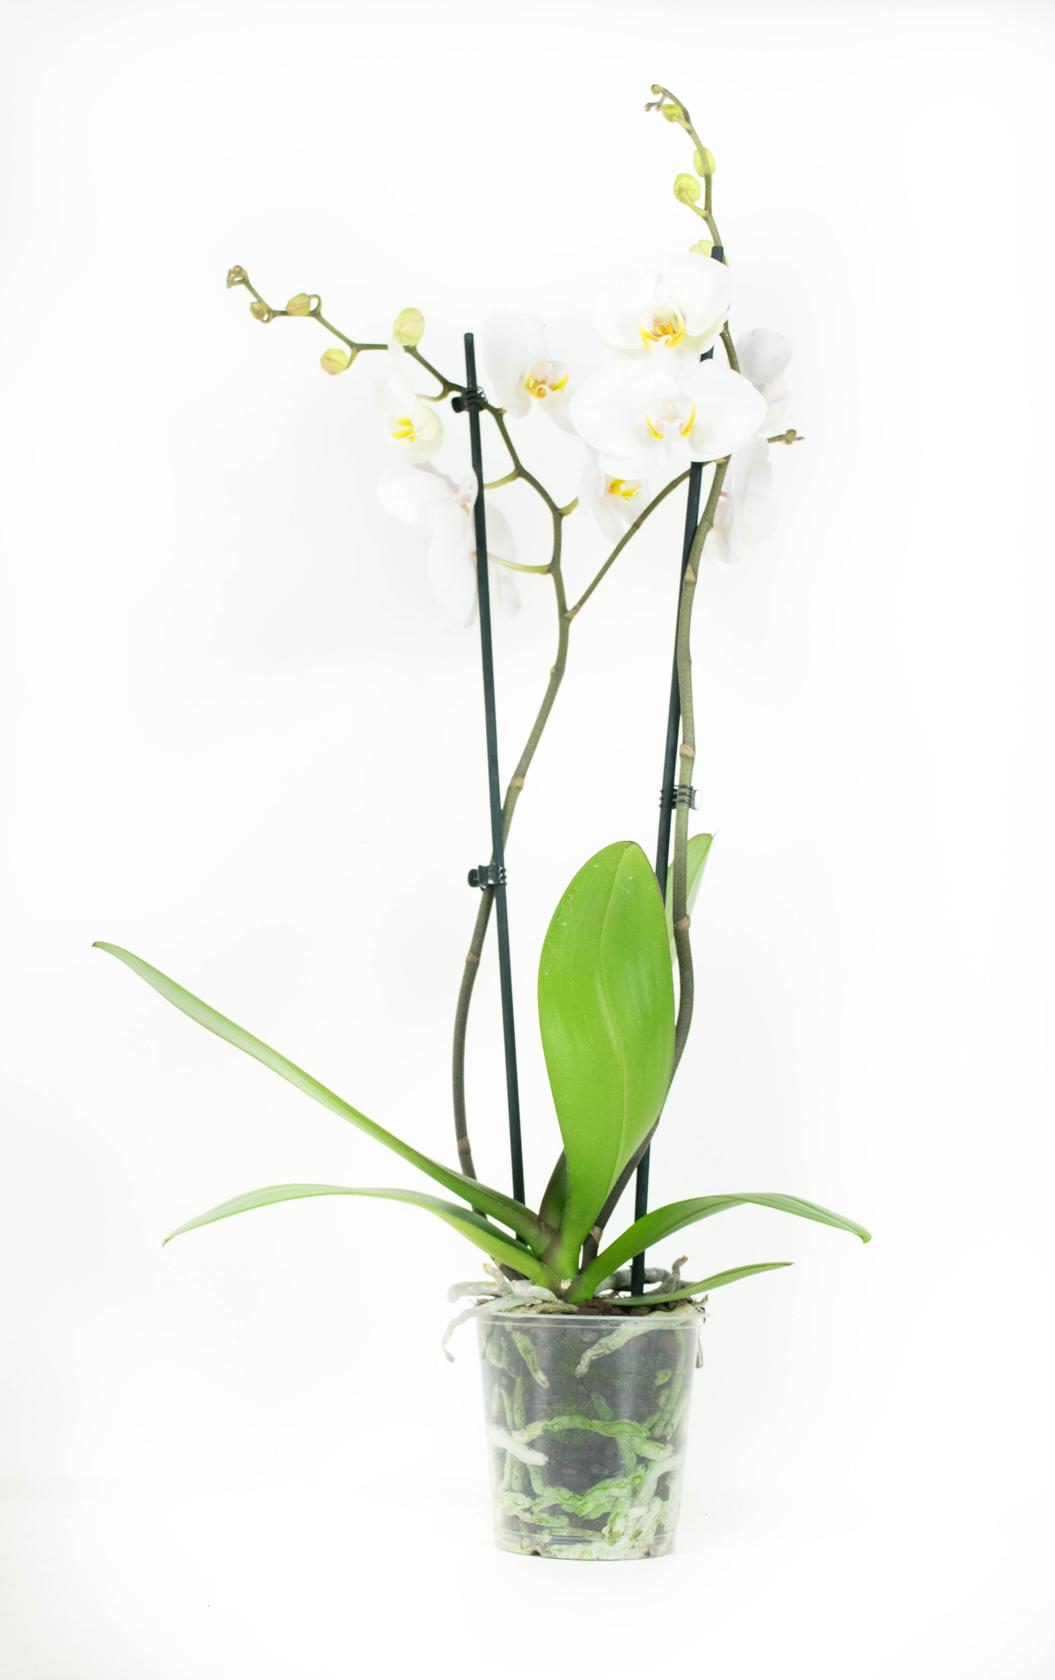 2 stuks Orchidee Springtime 60cm hoog 2 takken